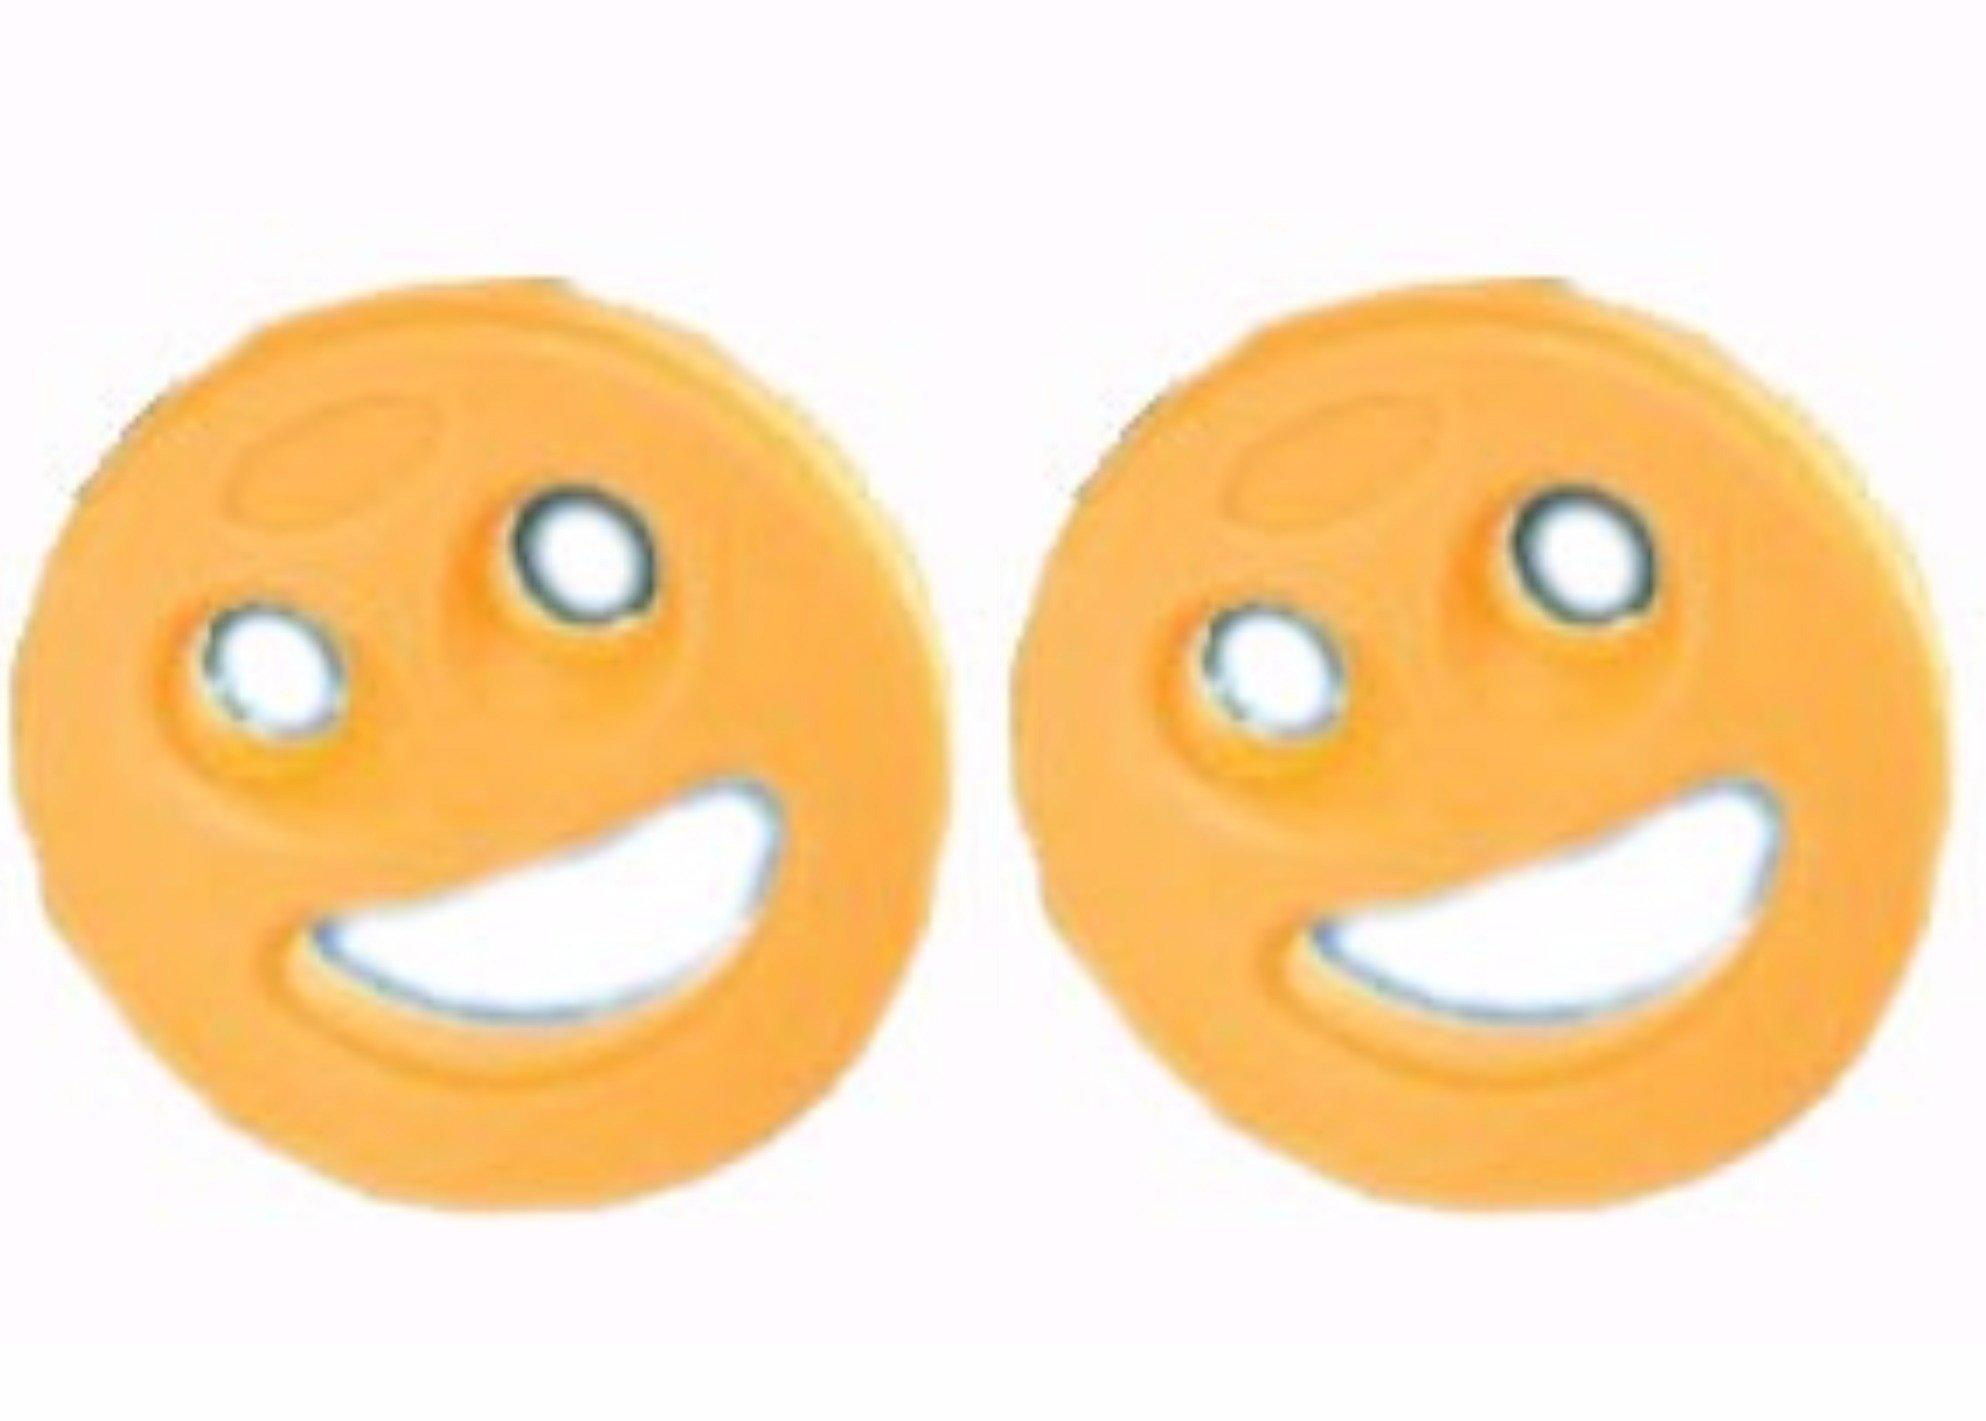 Orange Smile Fitness Exercise Aquadisc Foam Made Swimming Pool Floatable Dumbbell Hydrotherapy Arthritis Hand Buoy Rehab